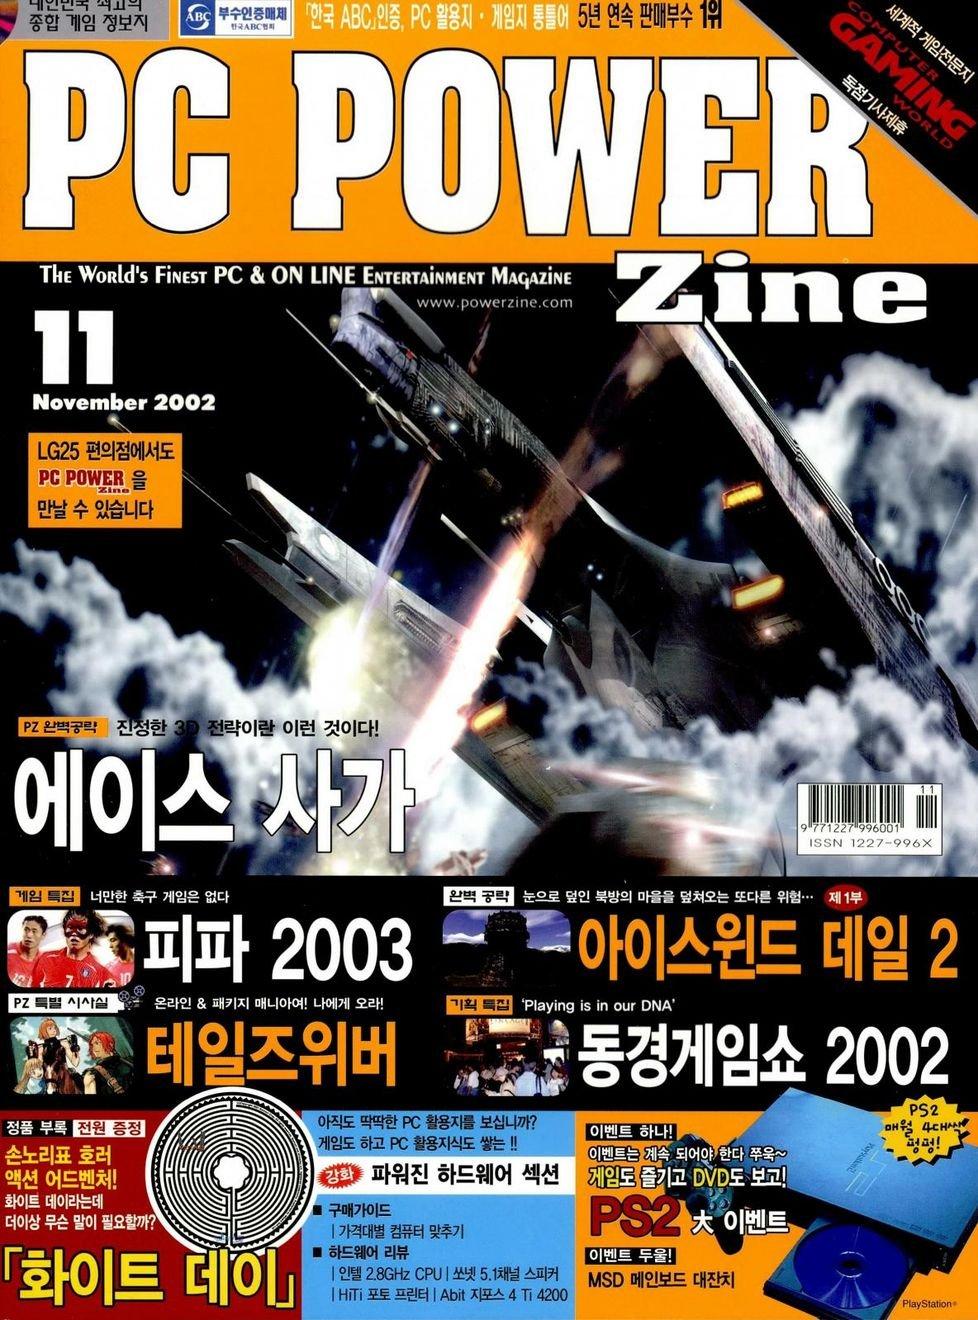 PC Power Zine Issue 088 (November 2002)